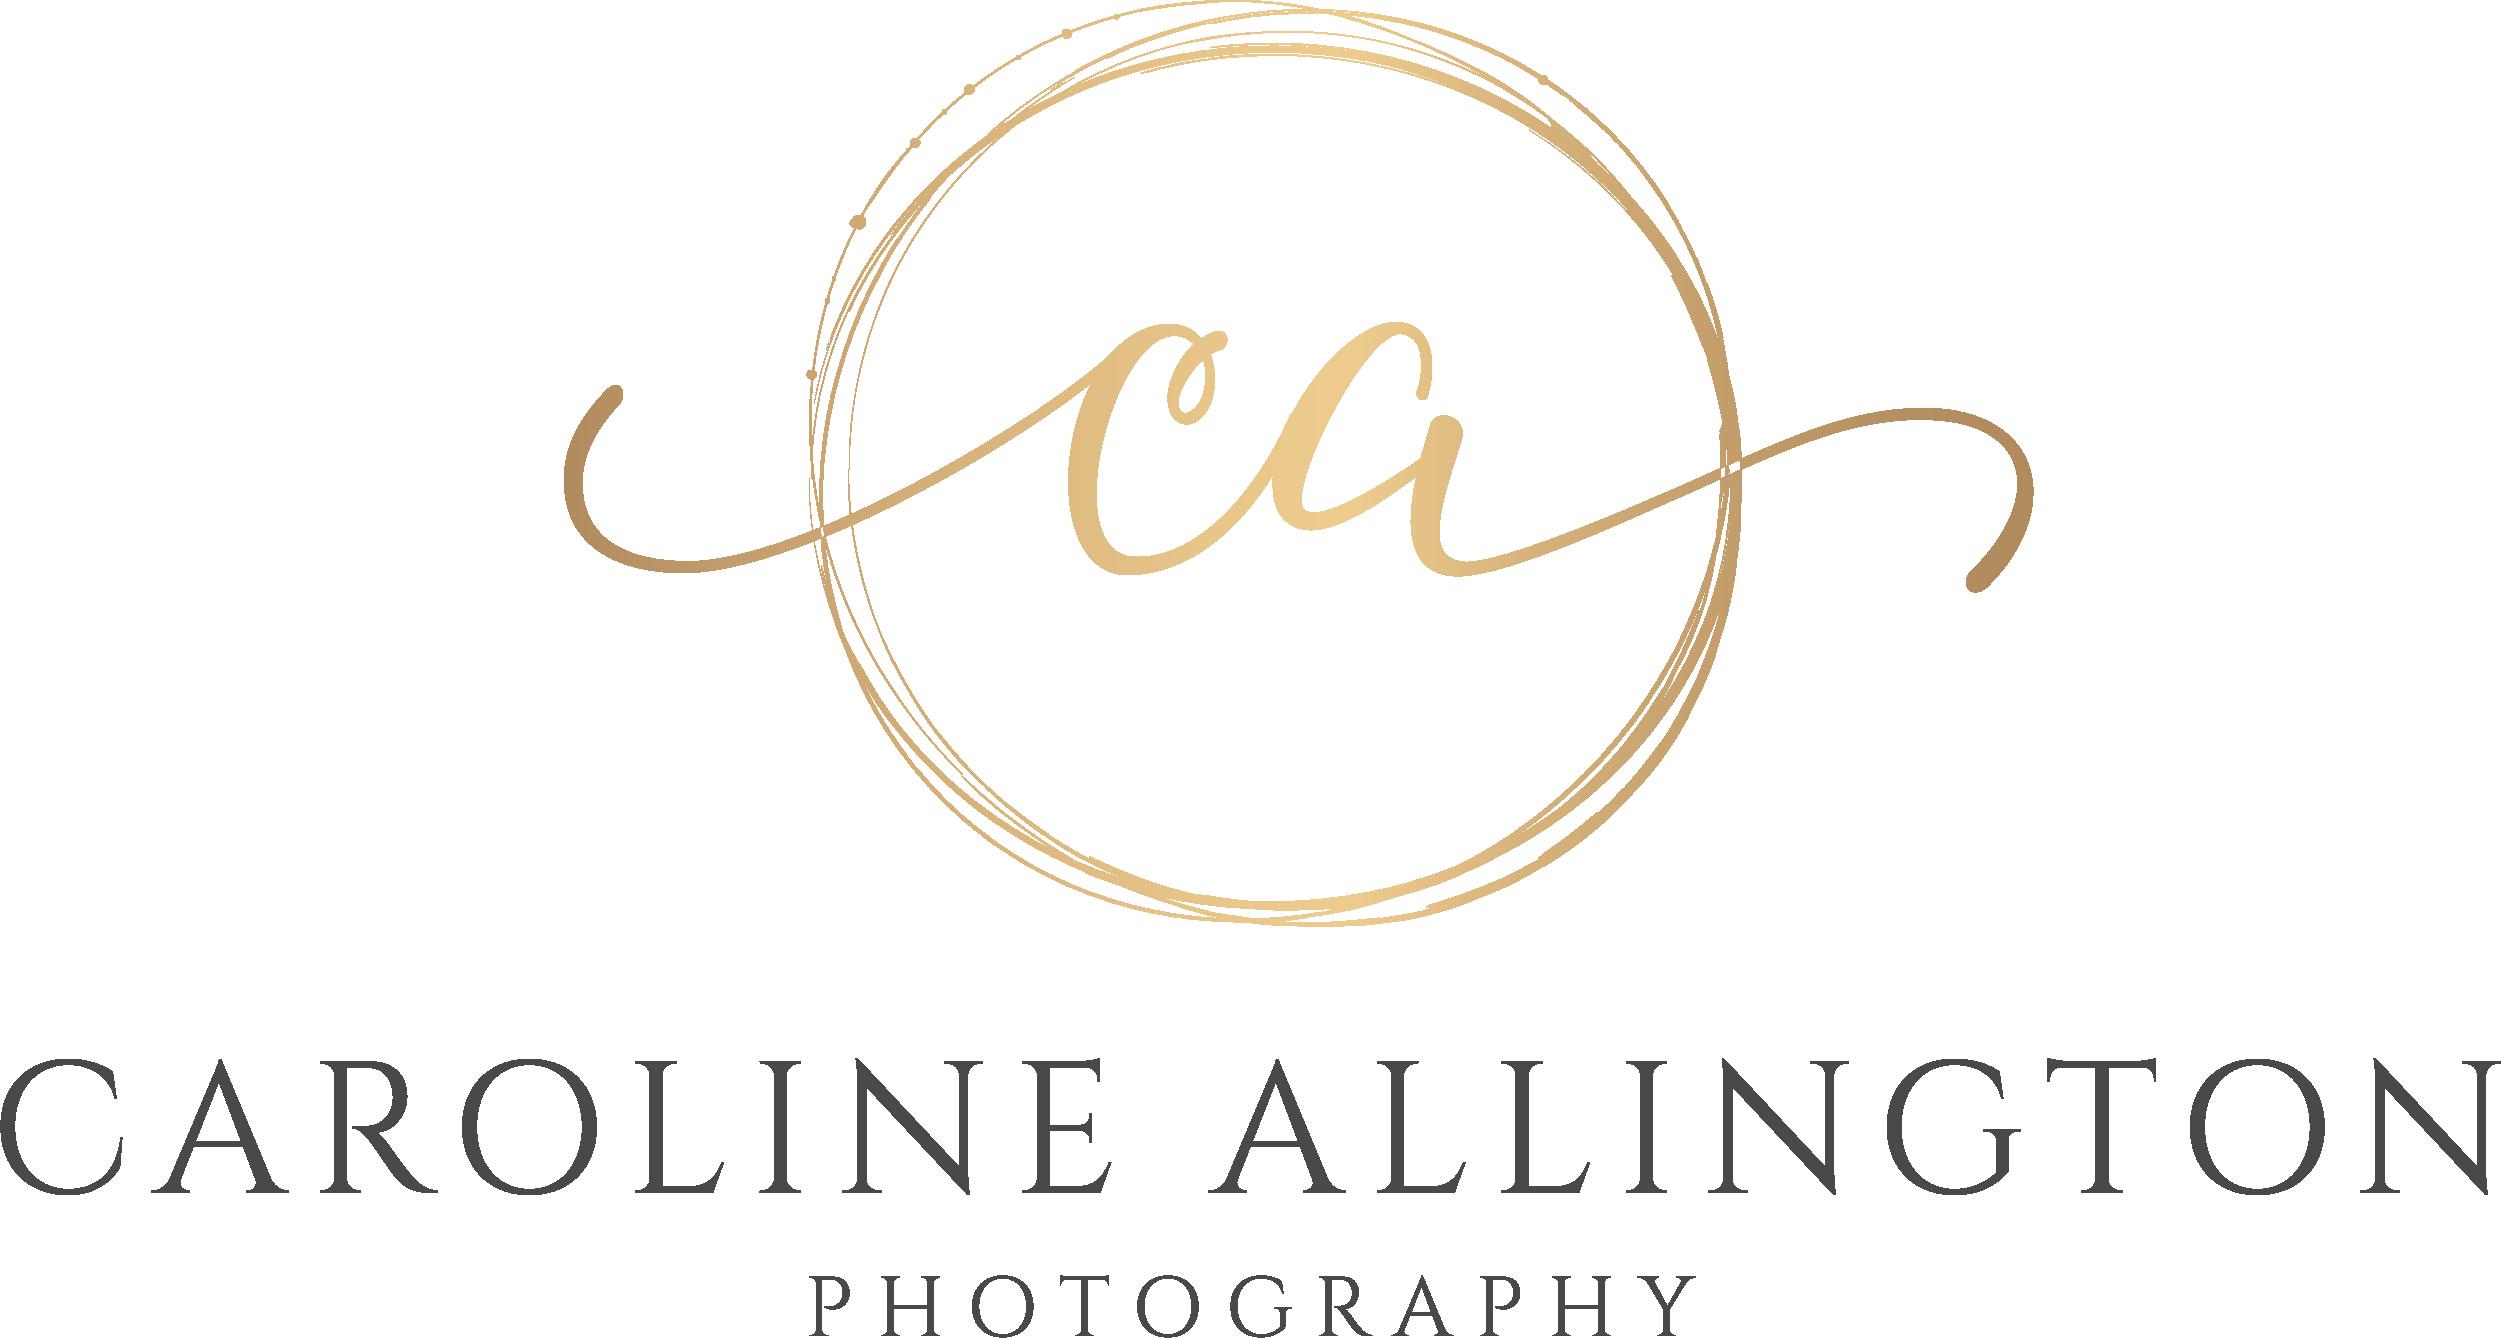 Caroline Allington Photography